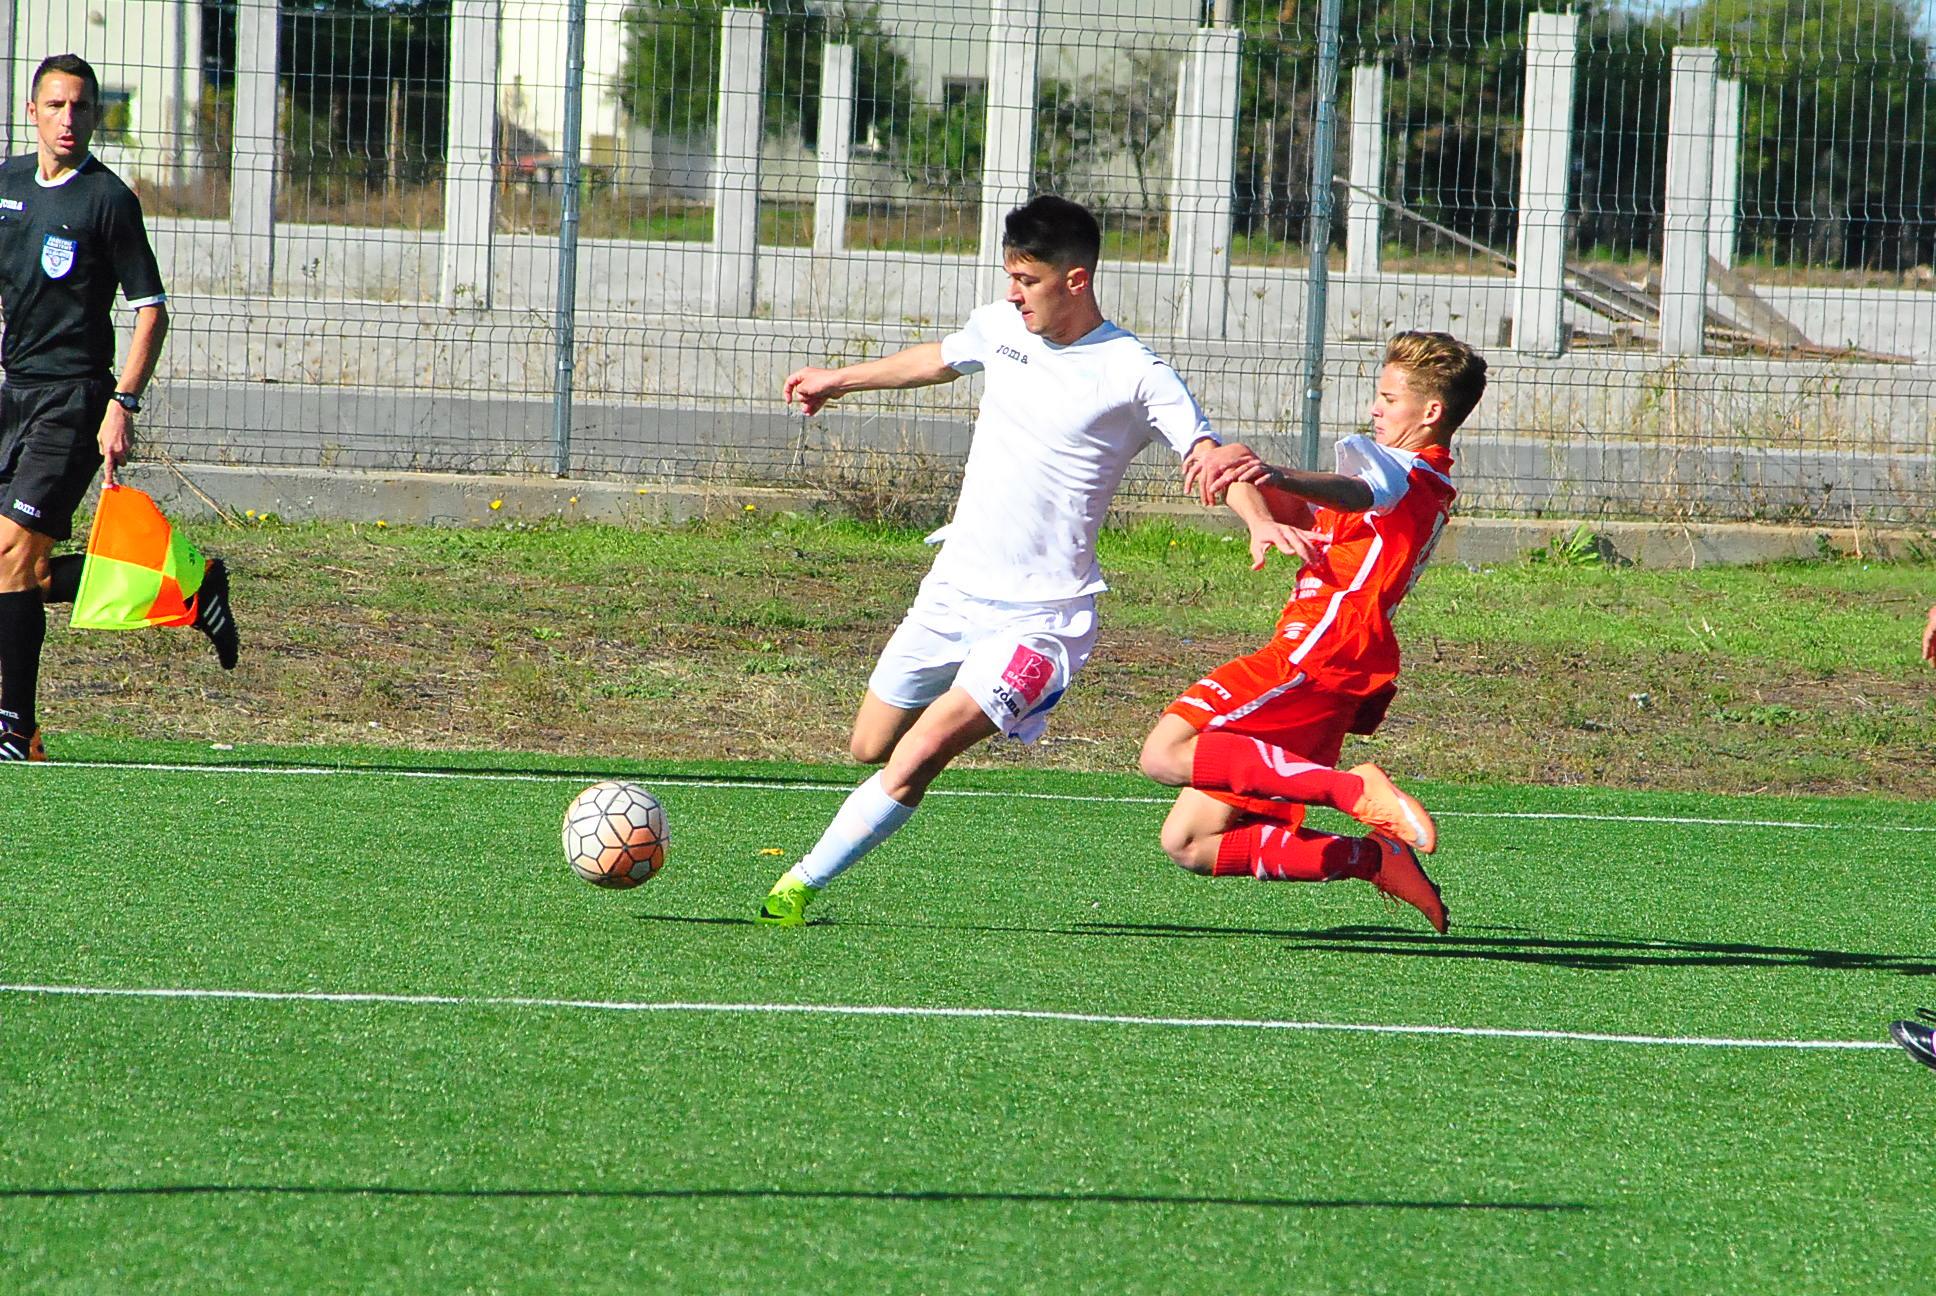 Fotbal juniori /CSU a dat 14 goluri vâlcenilor